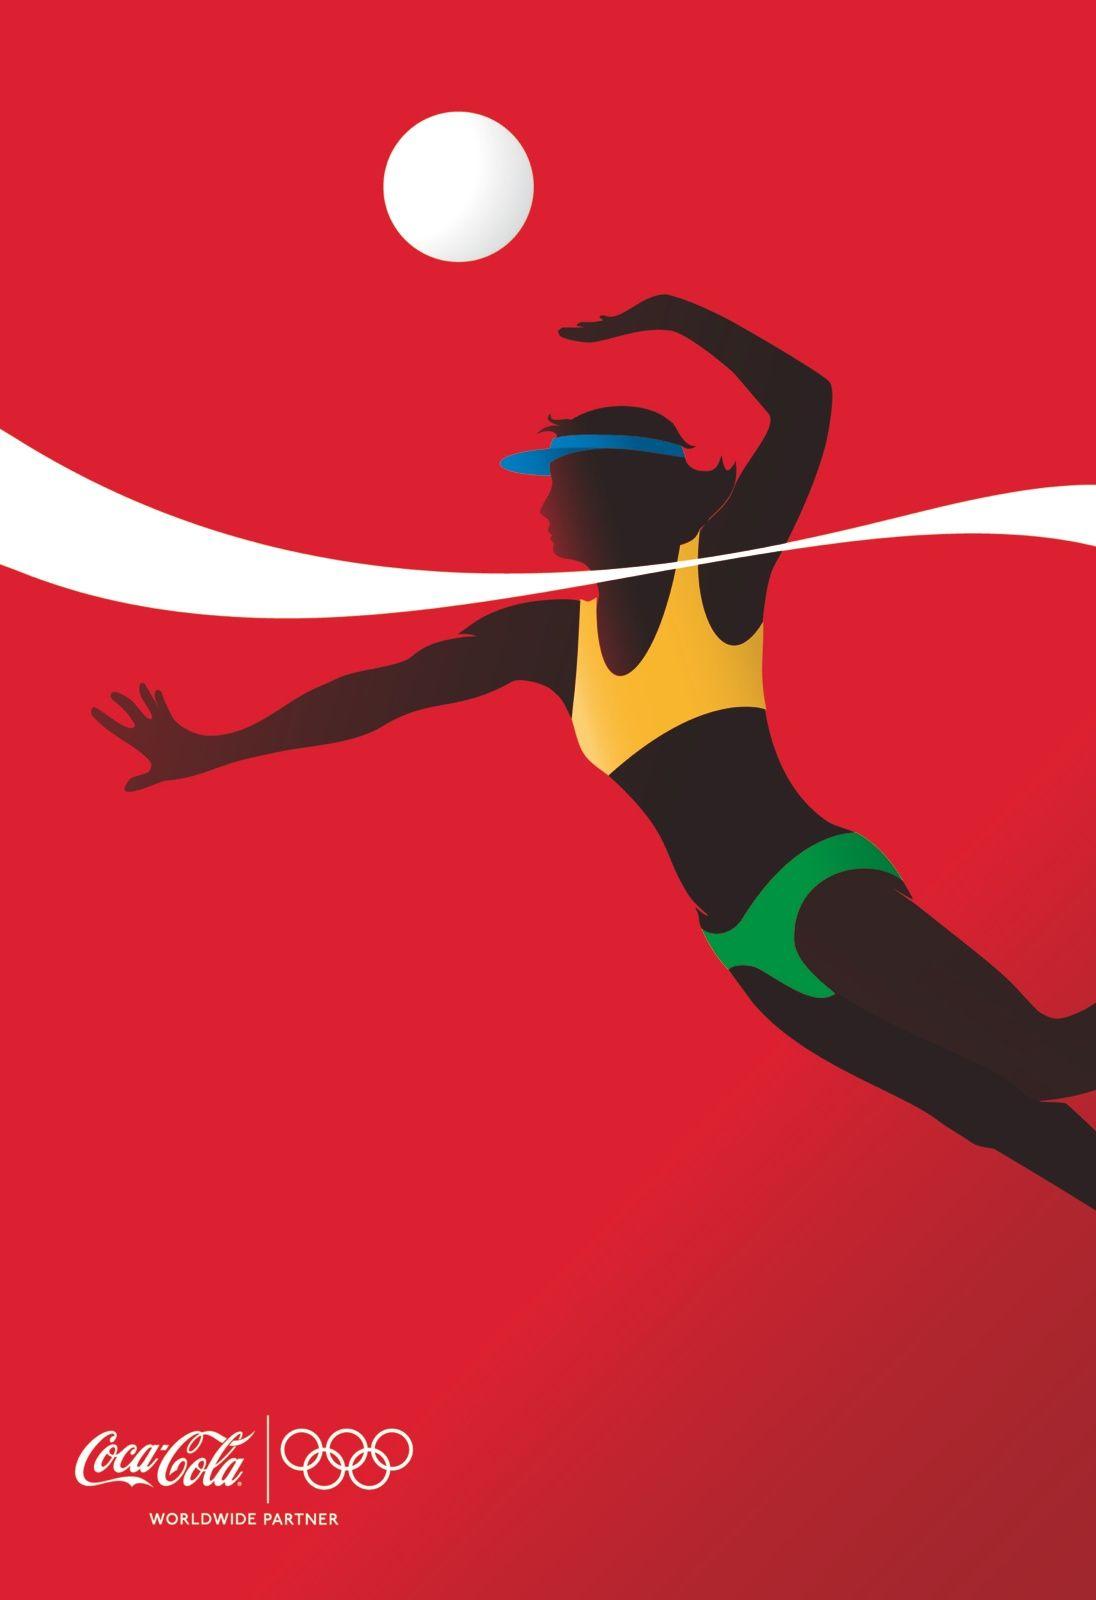 adv / Coca-Cola: Athletes, Beach Volleyball Player